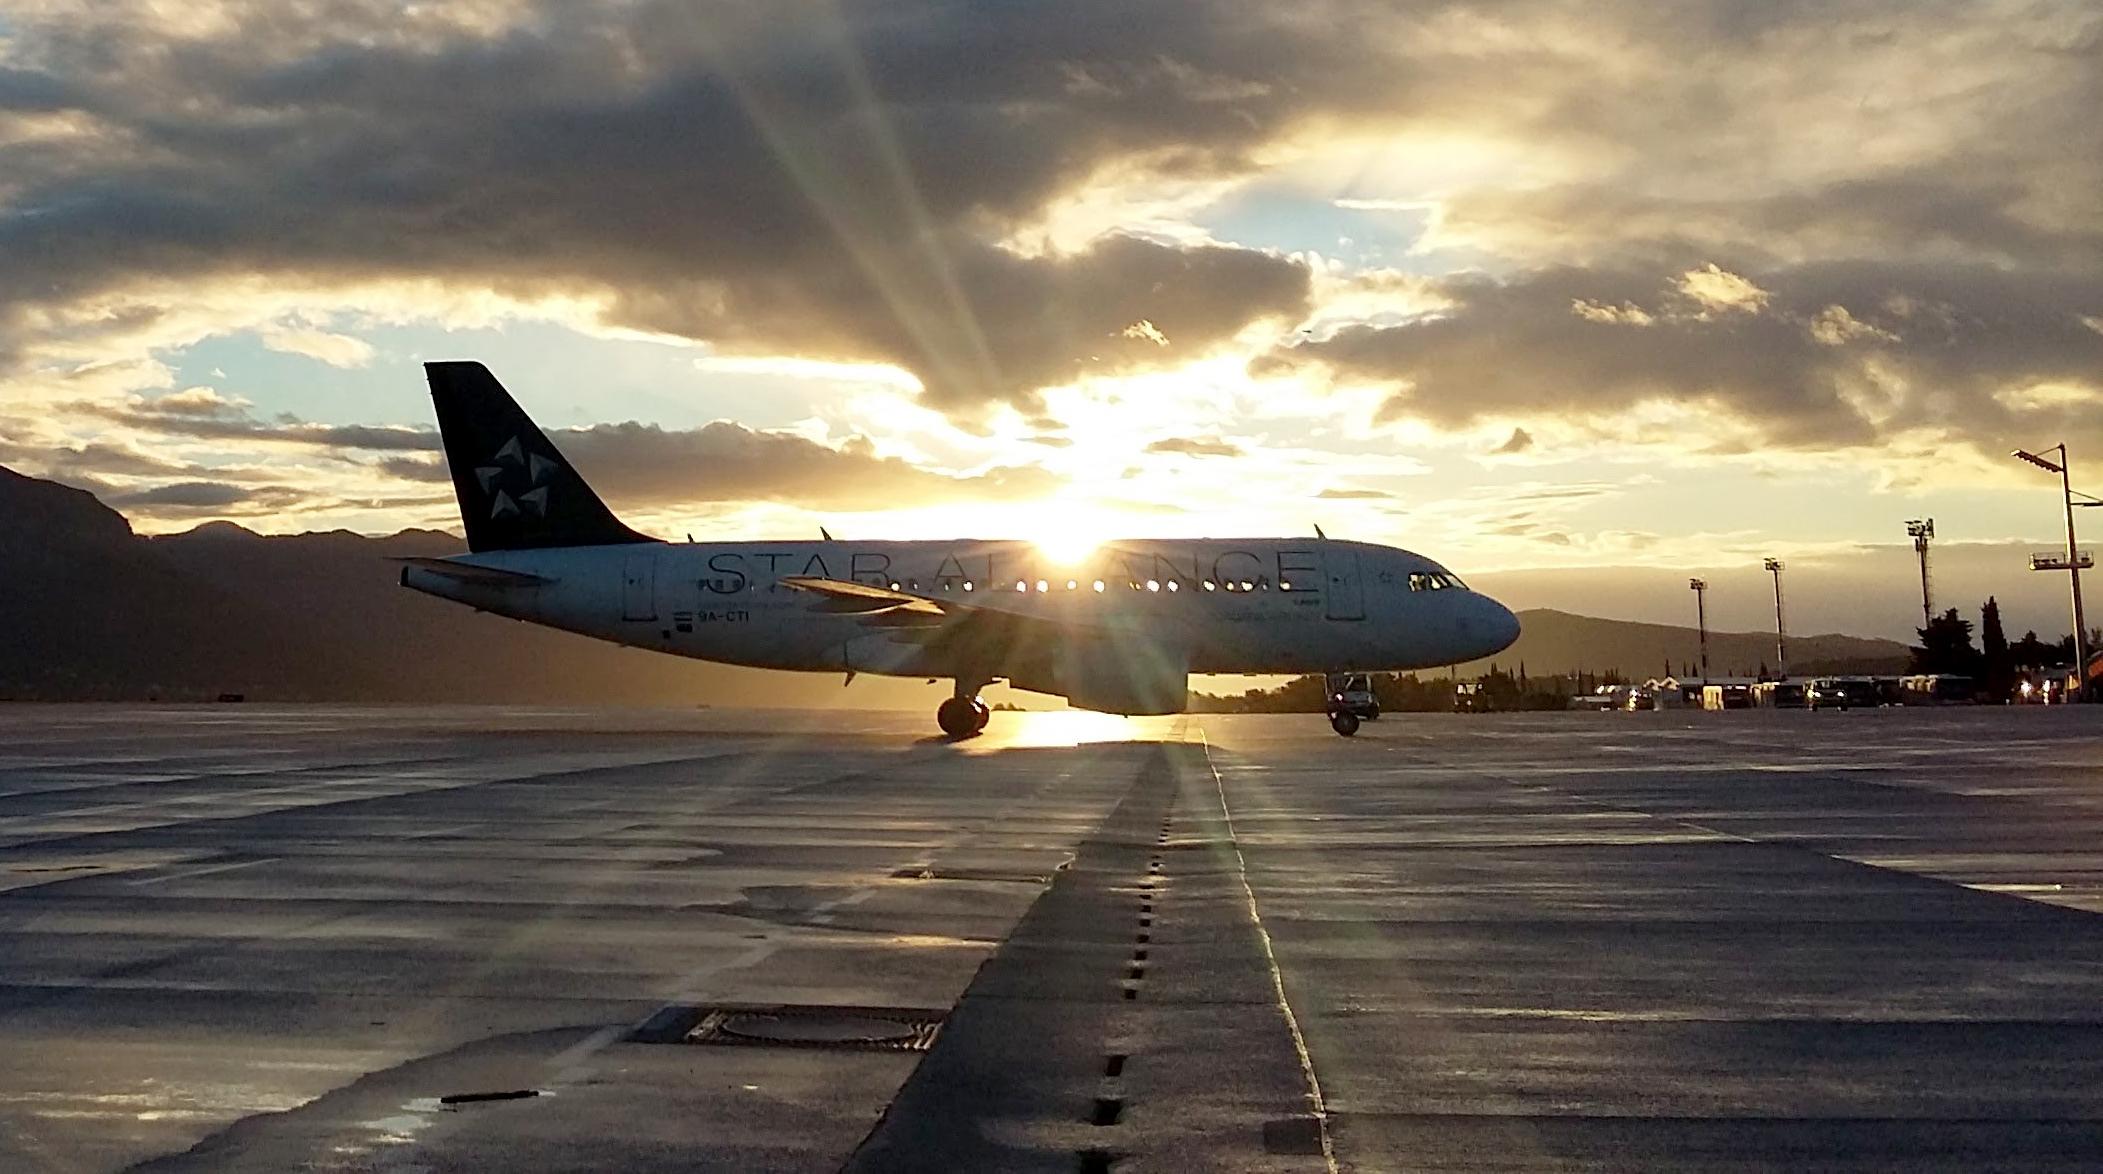 Star Alliance Plane Sunset (Marina Hinic).jpg